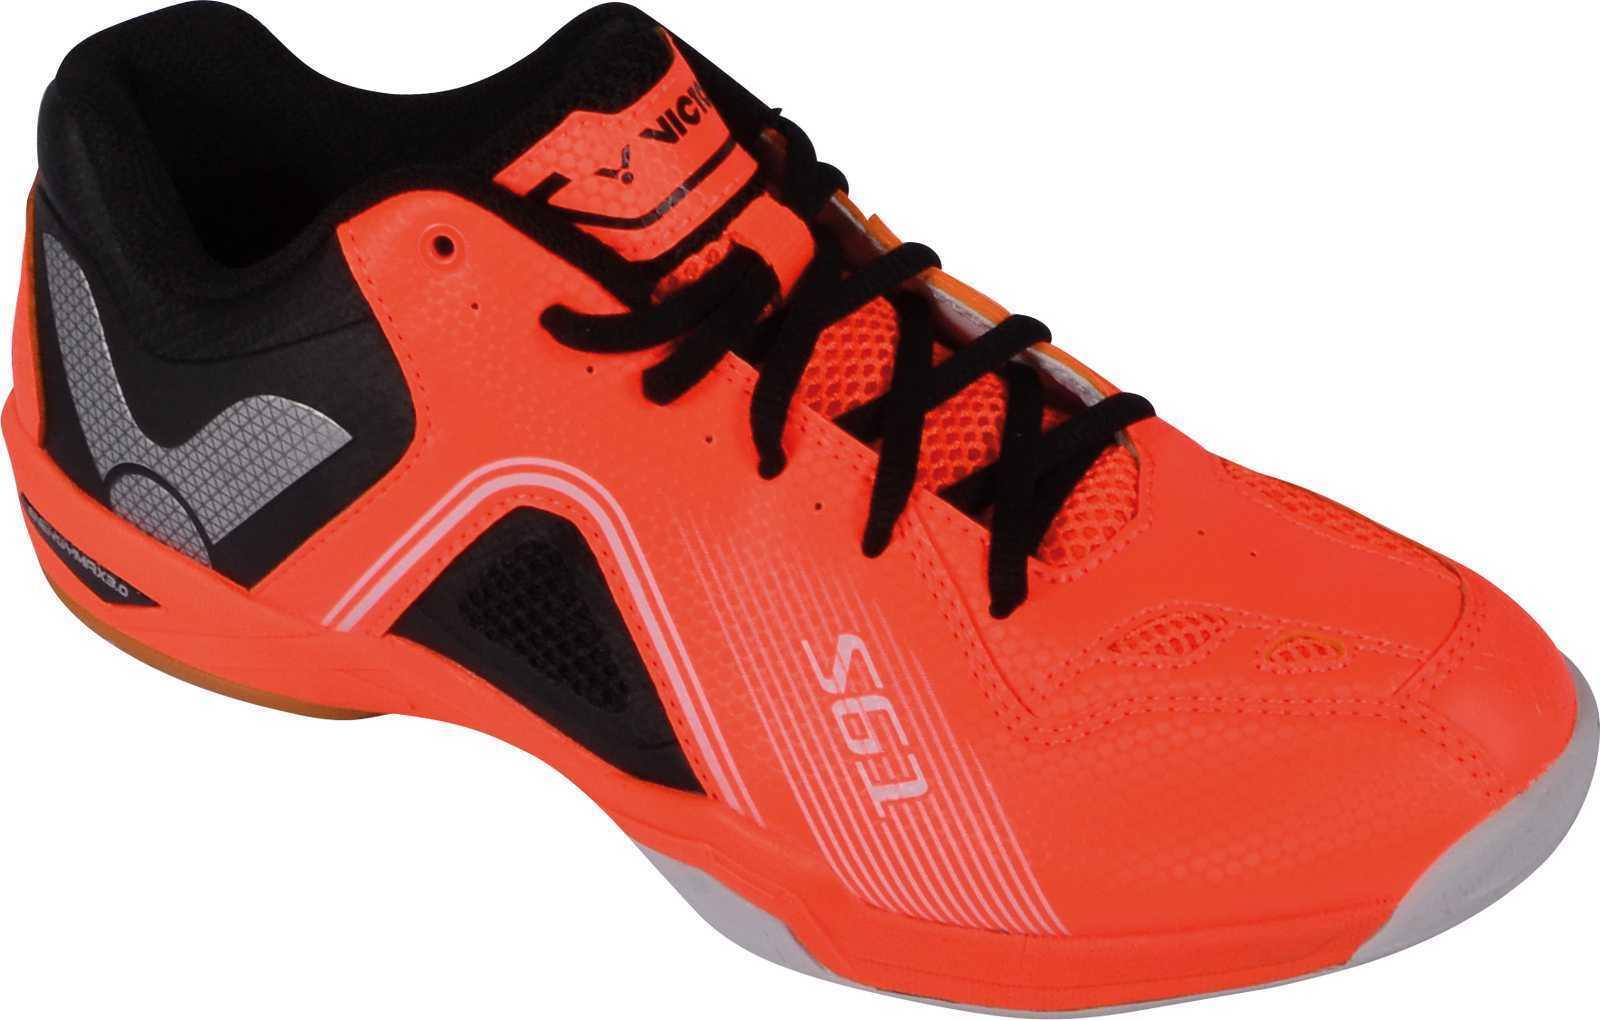 Victor schuhe SH-S61 Orange  Badminton schuhe